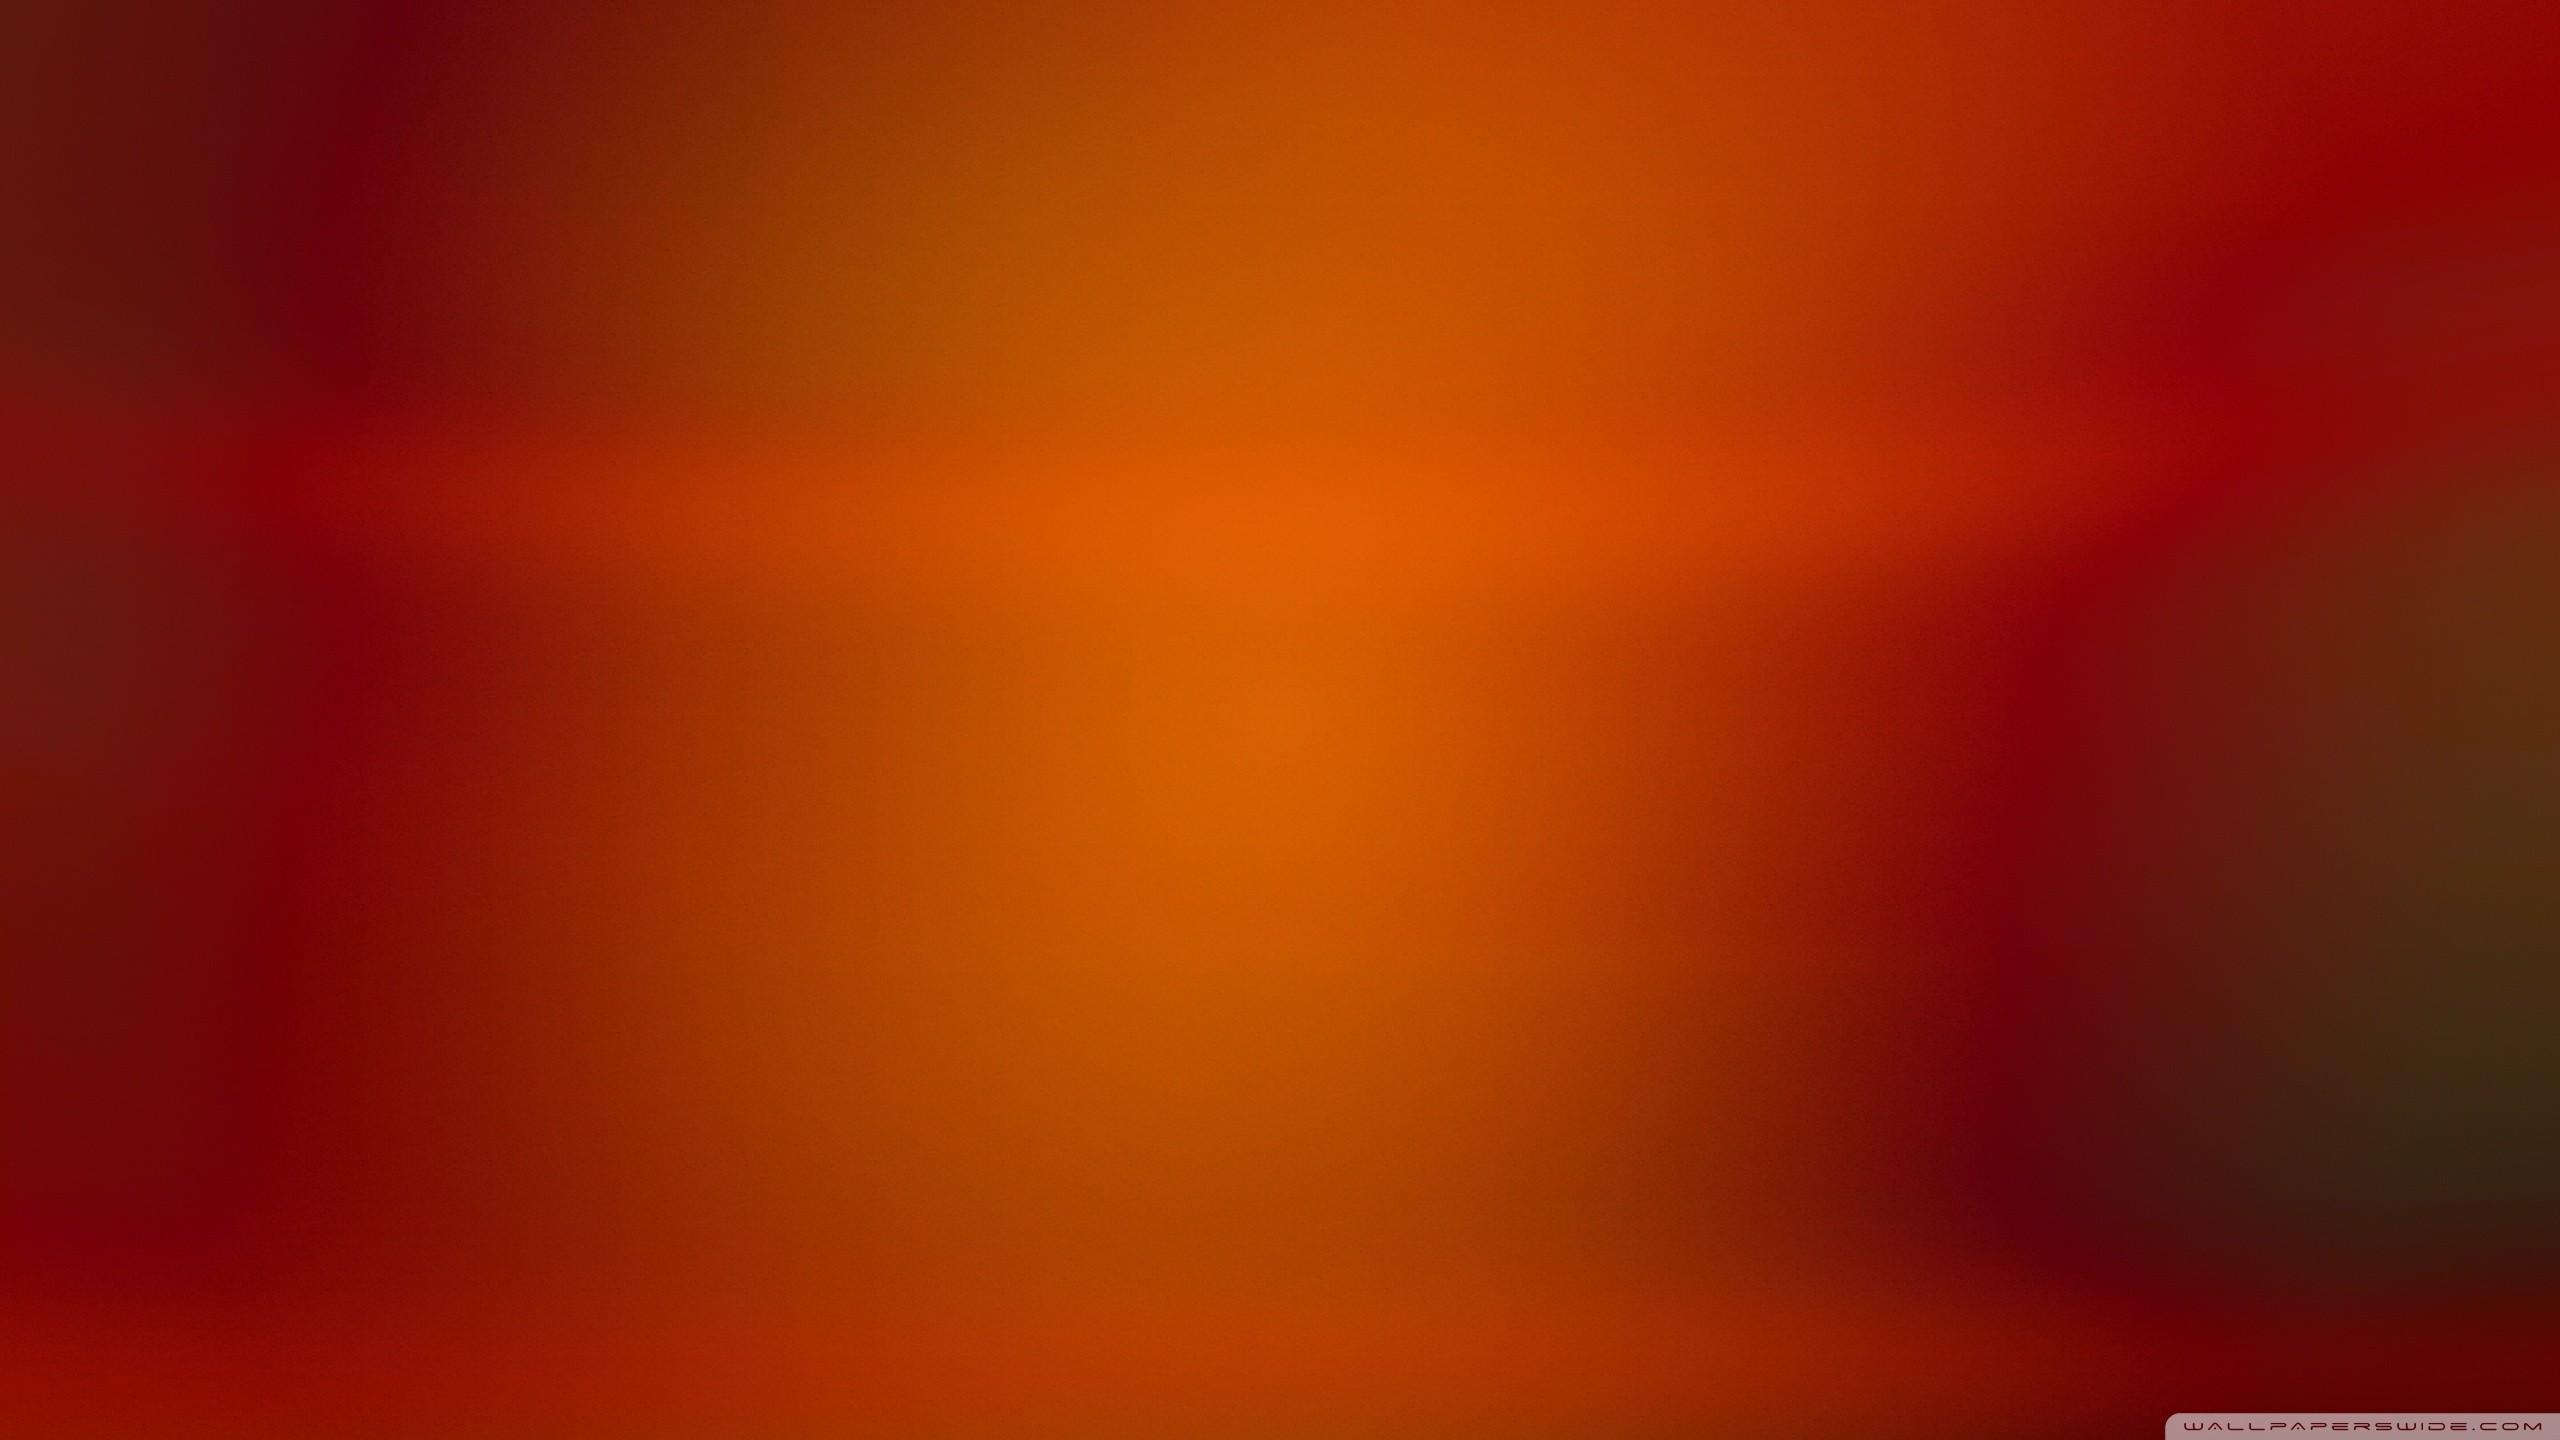 Burnt orange wallpaper 54 images - Dark orange wallpaper ...